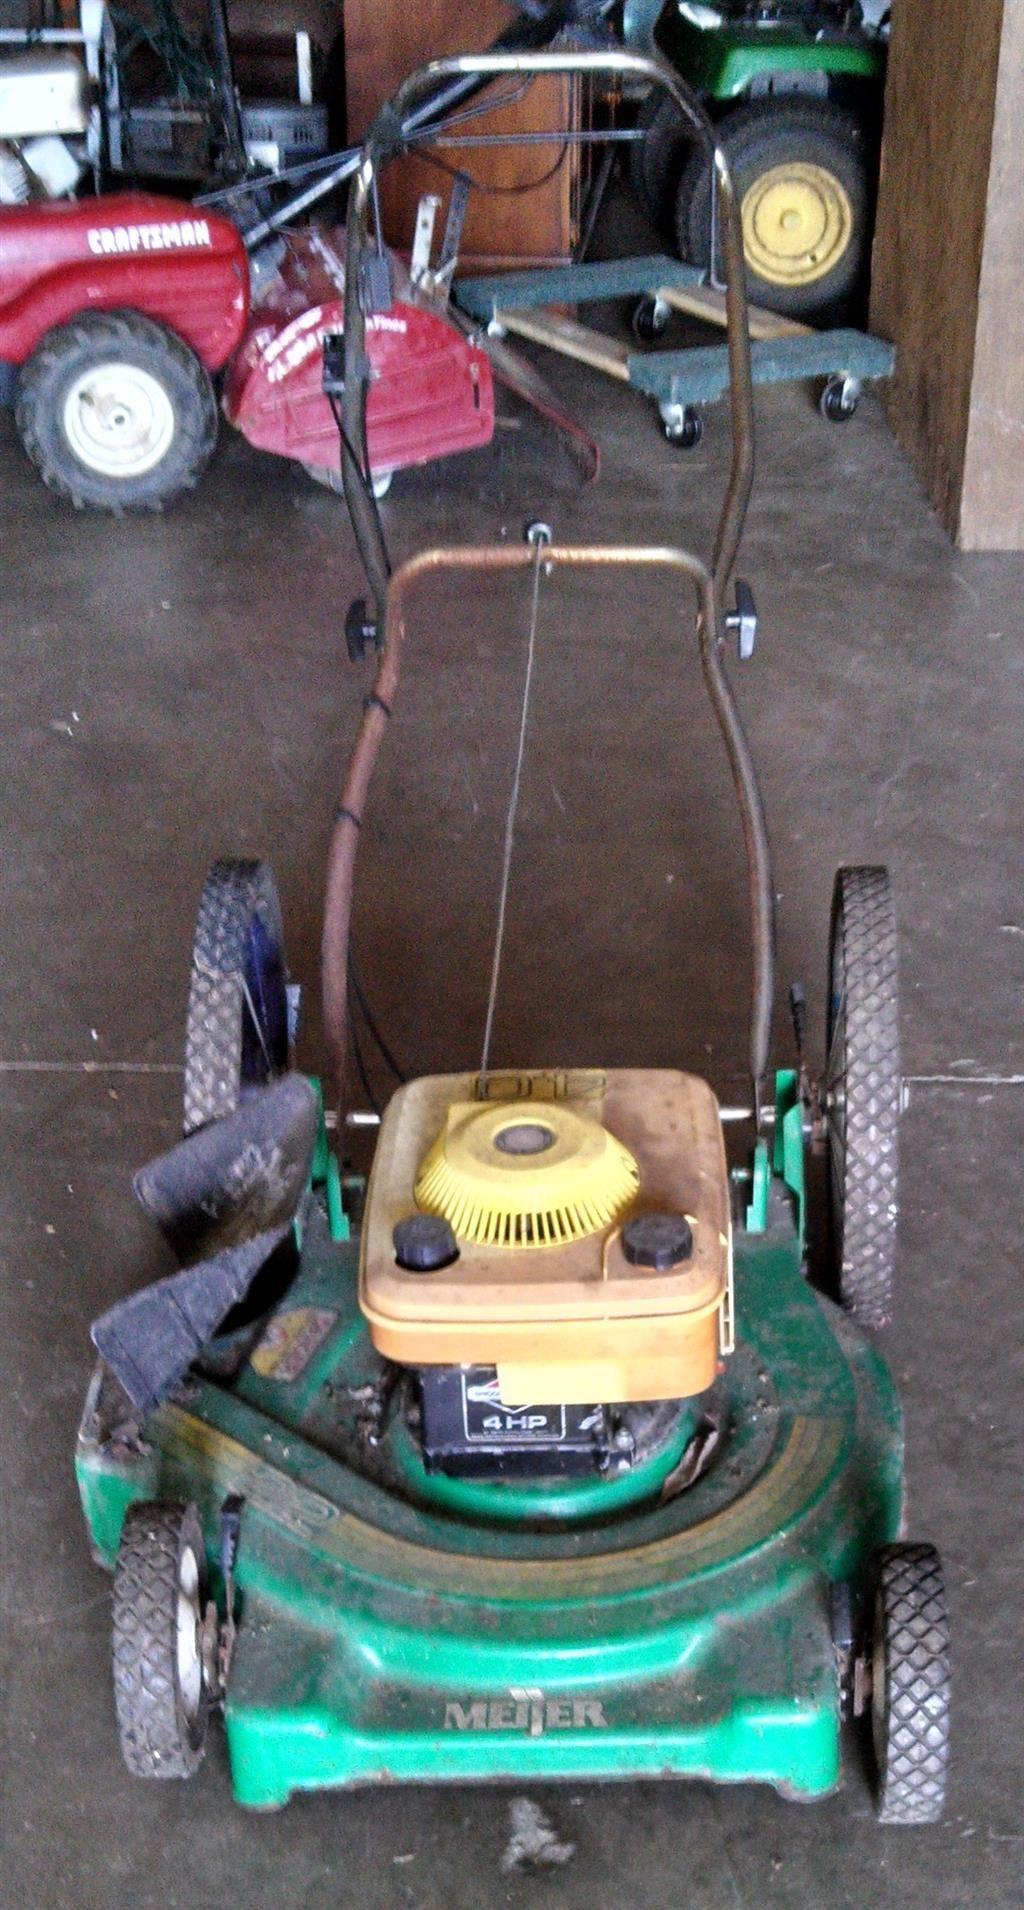 Green Meijer Brand Push Lawn Mower Auction Items Push